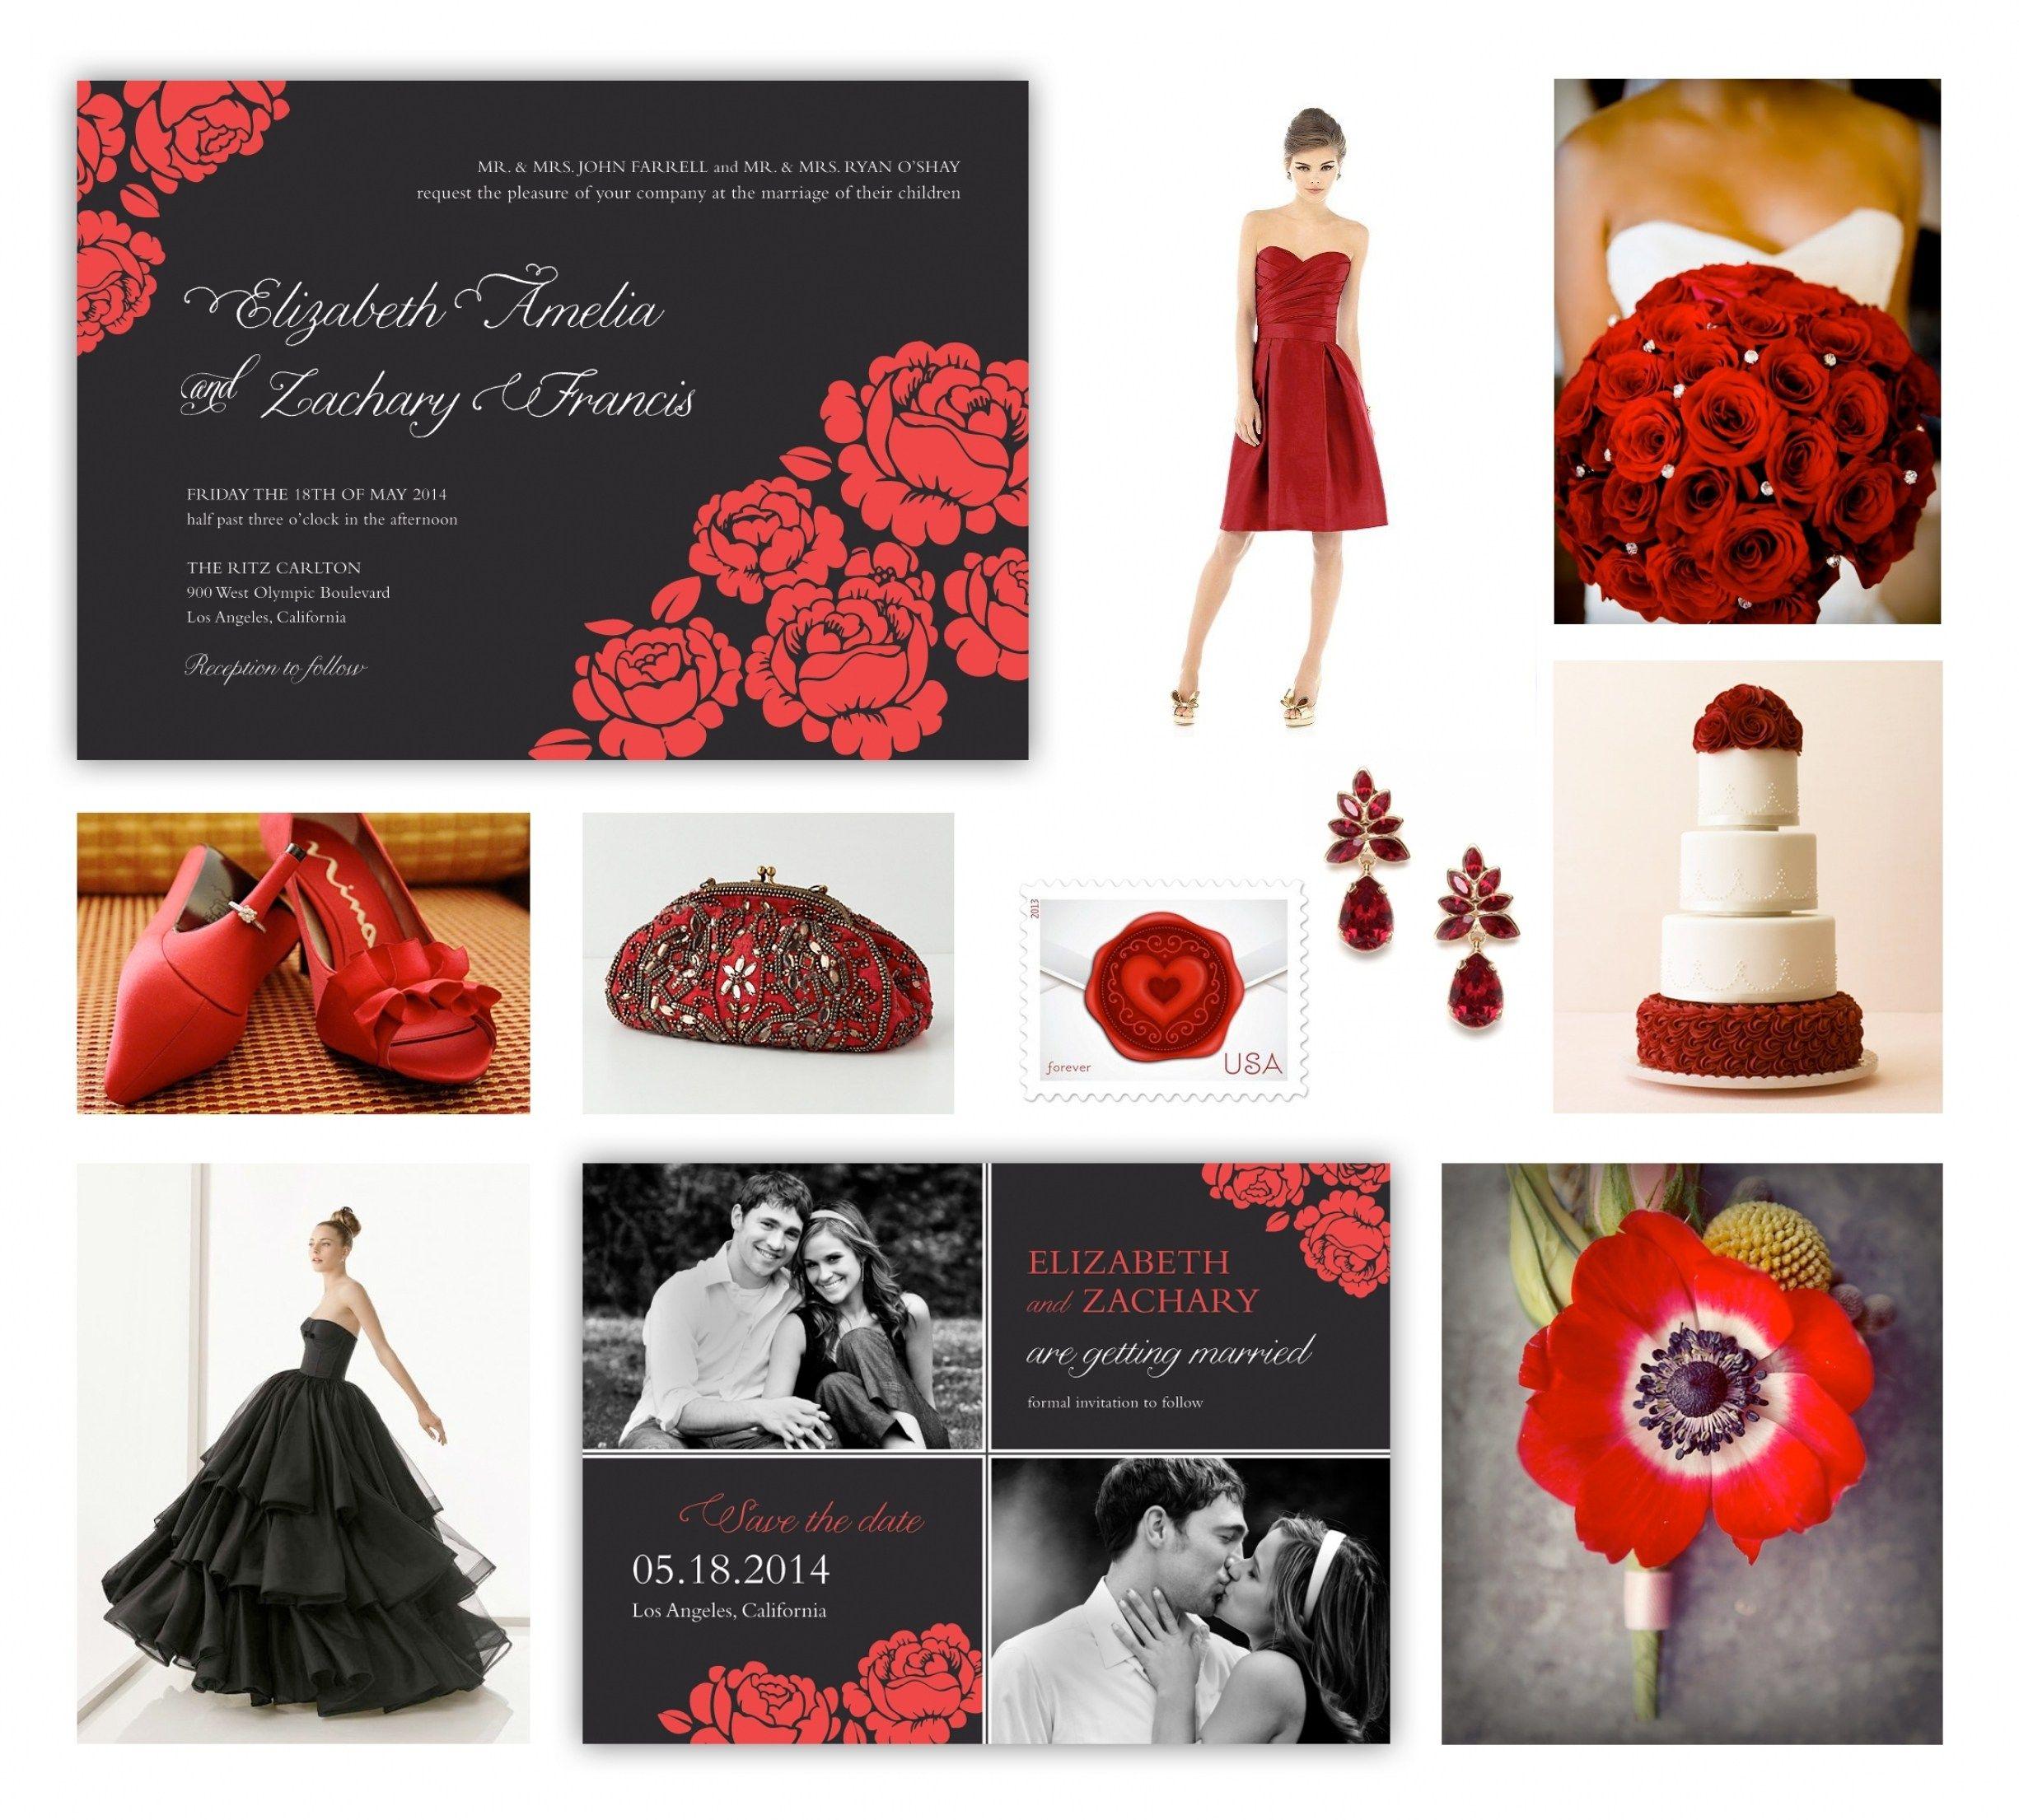 Amazing 30 Invitation Red Rose Wedding | Red rose wedding, Wedding ...